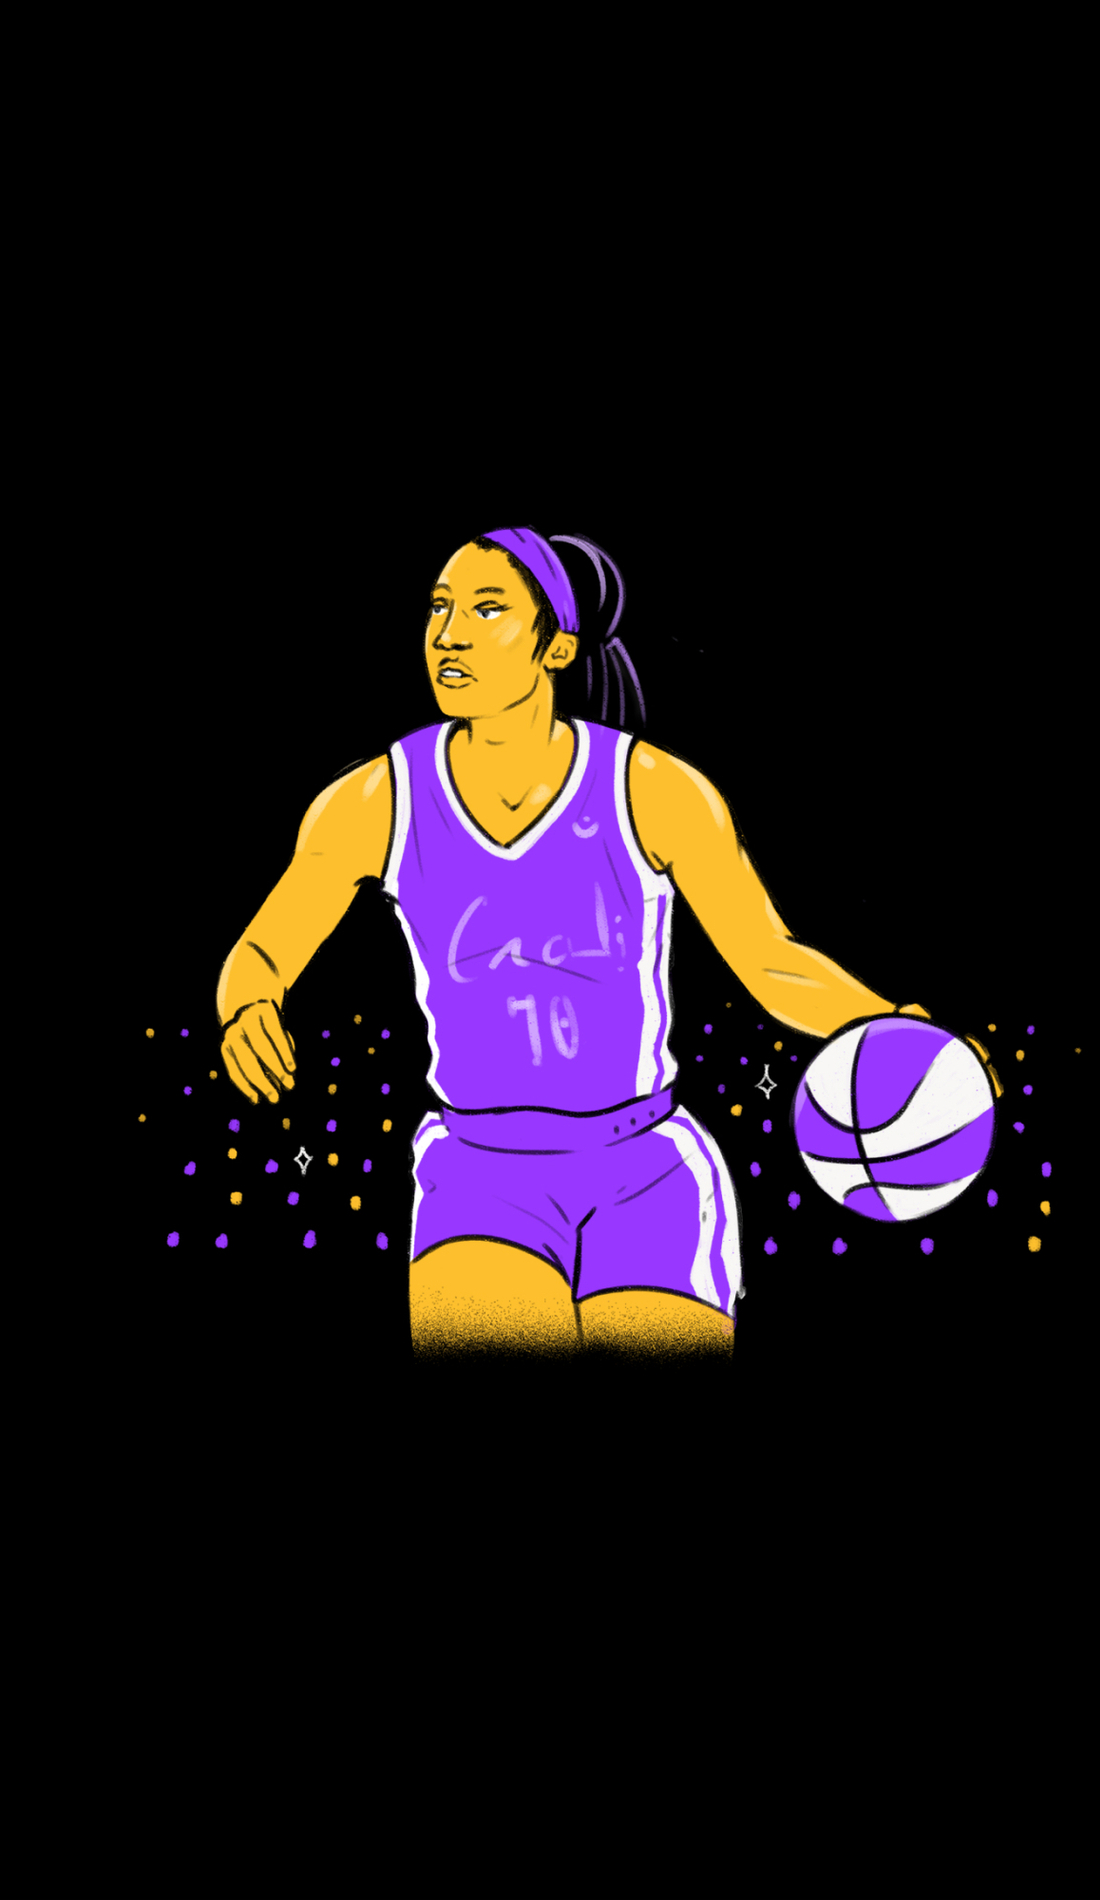 A Florida Gulf Coast Eagles Womens Basketball live event